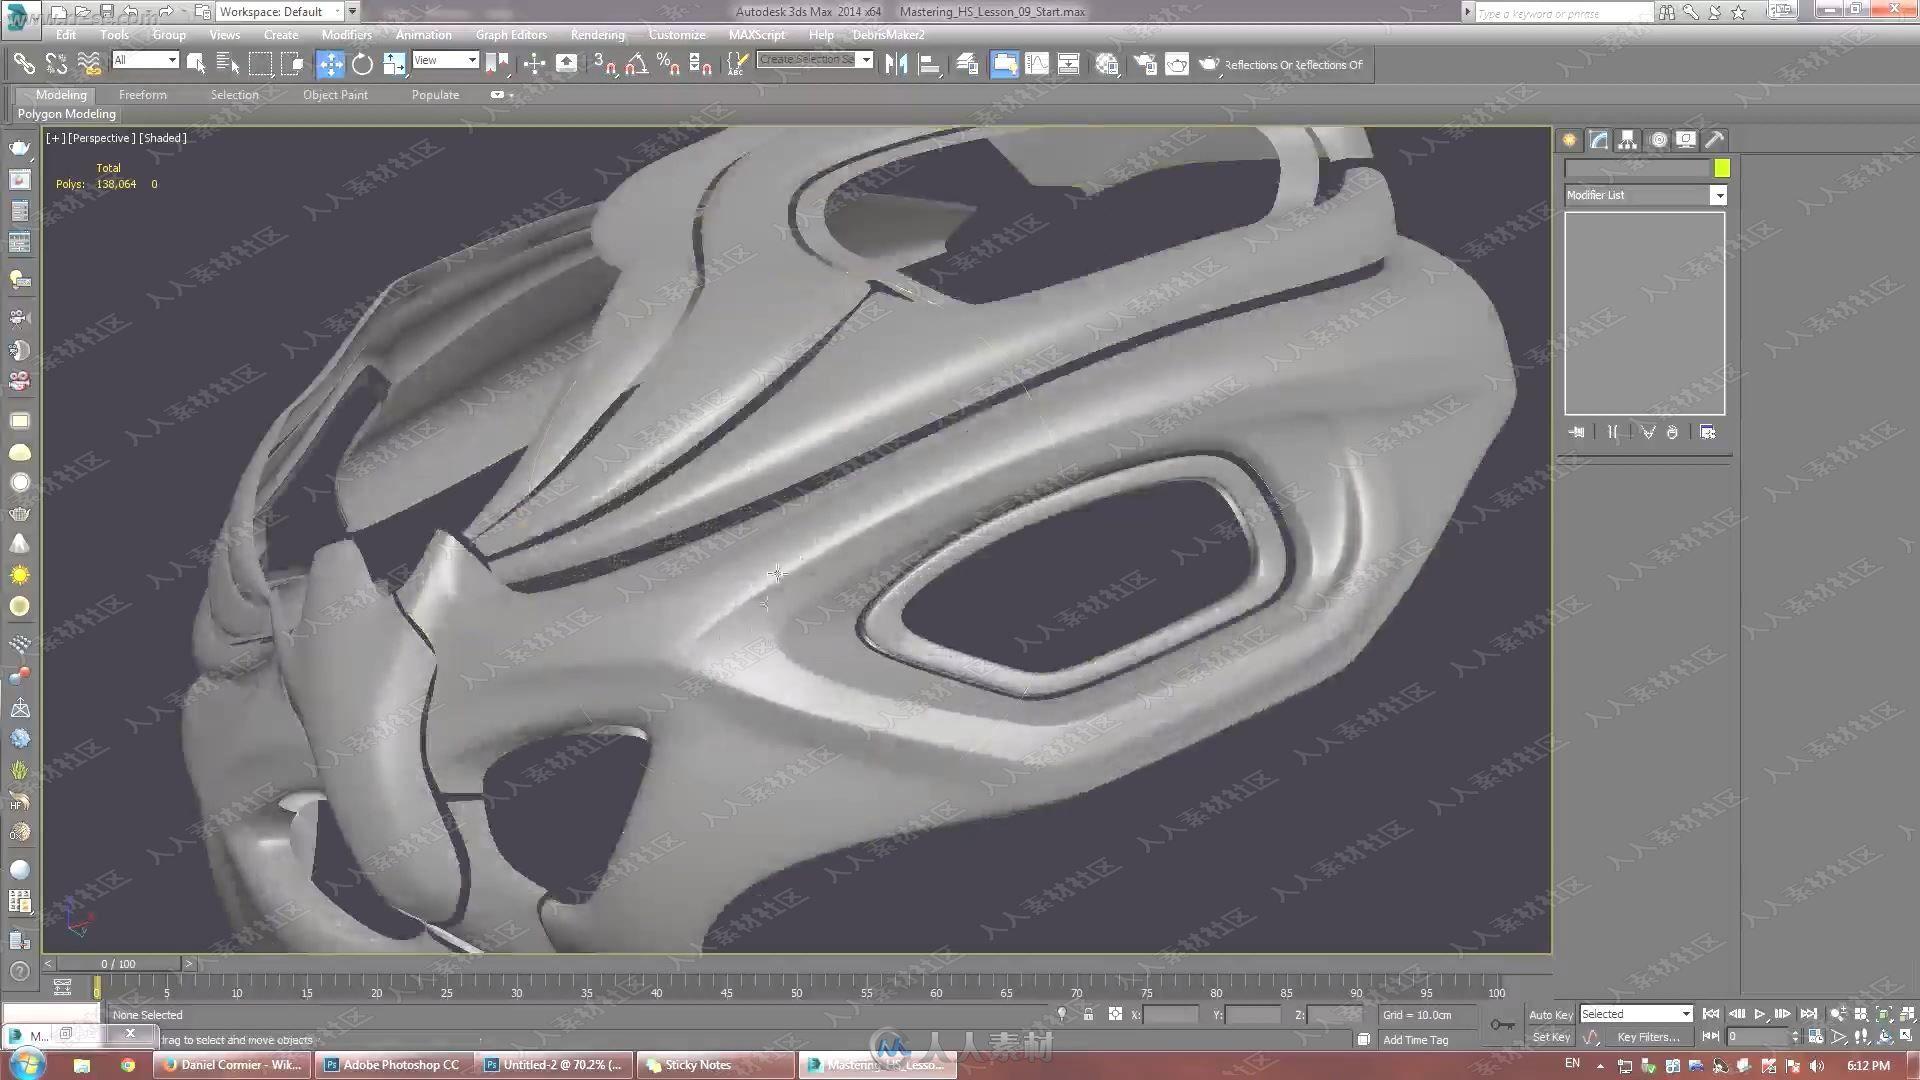 3Dmax钢制硬表面建模视频教程